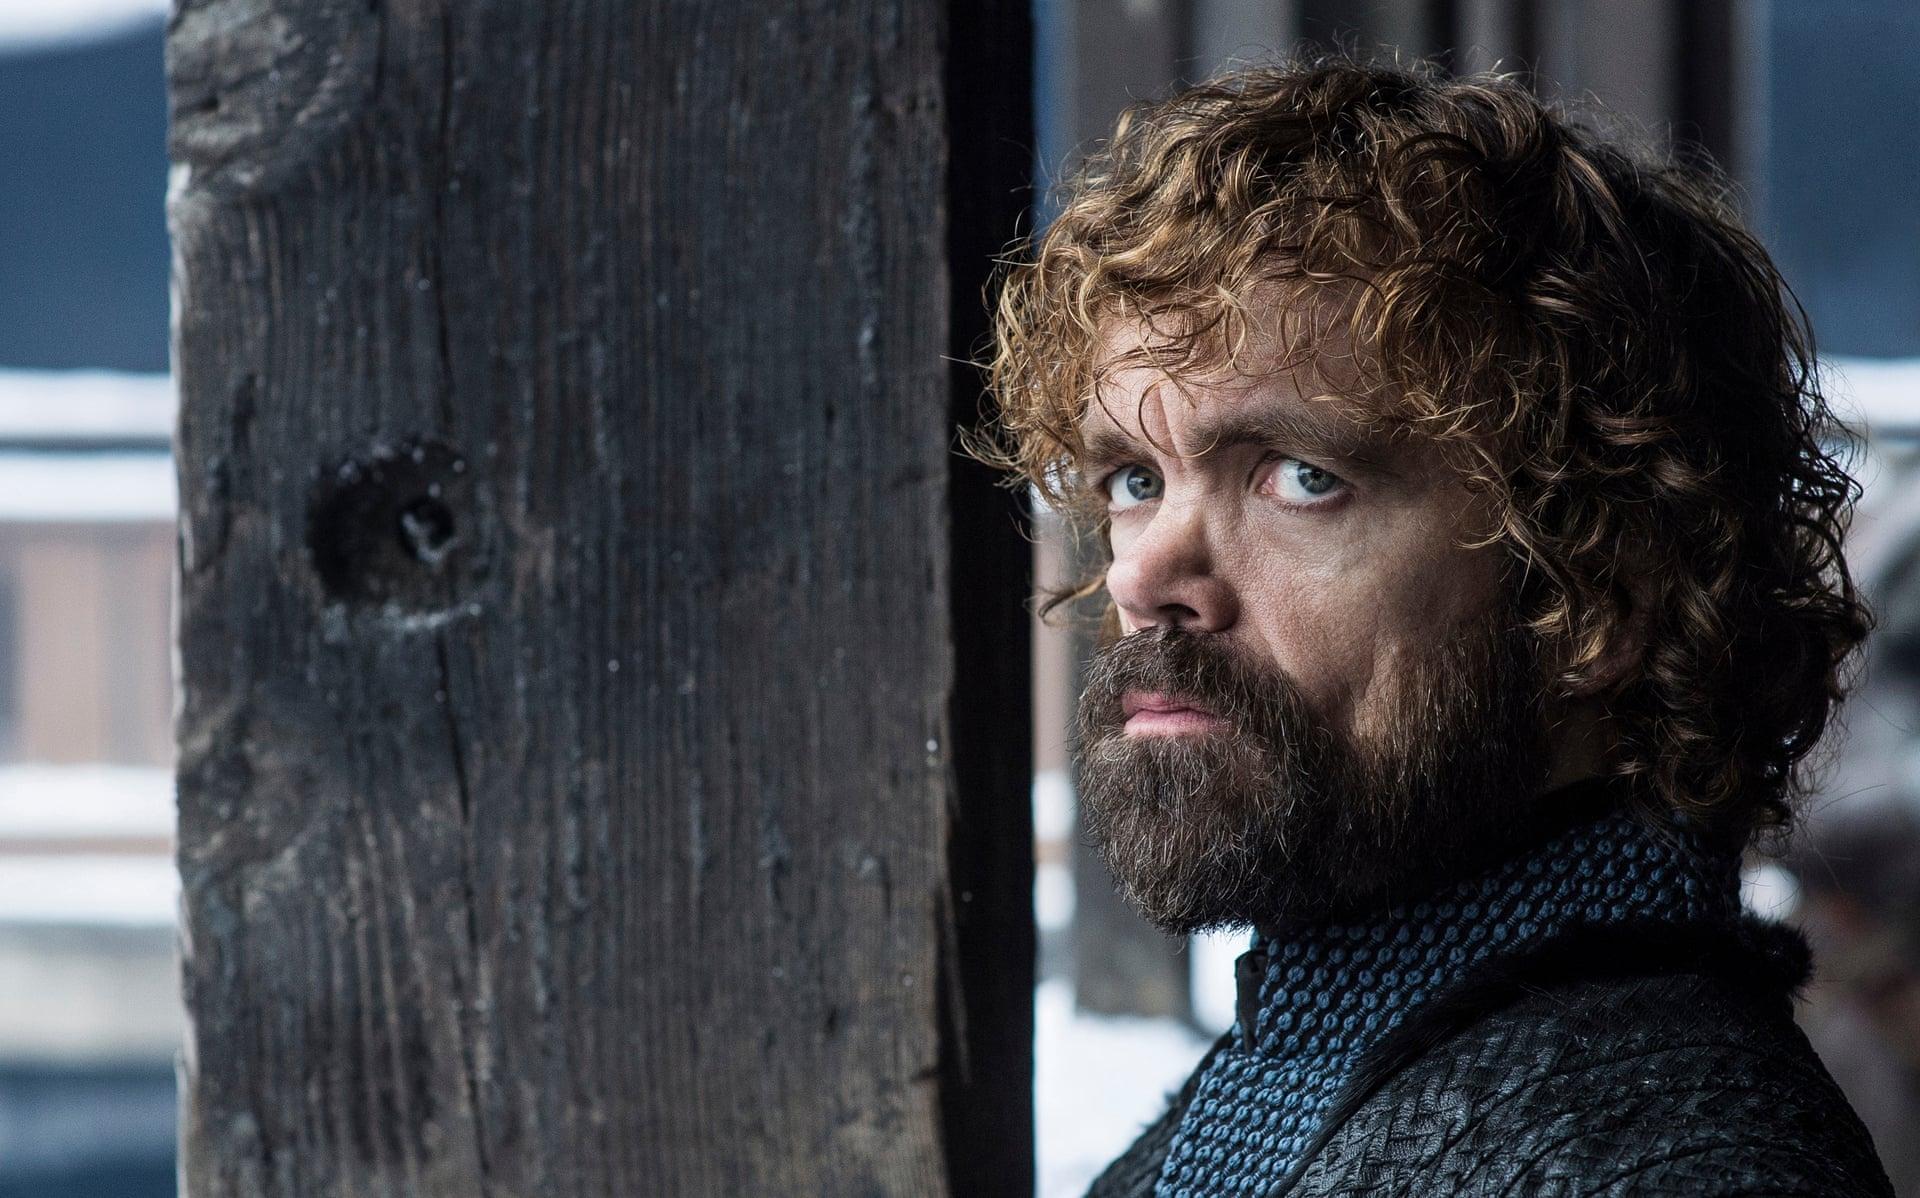 Game of Thrones: Season 8 Episode 1 – Winterfell